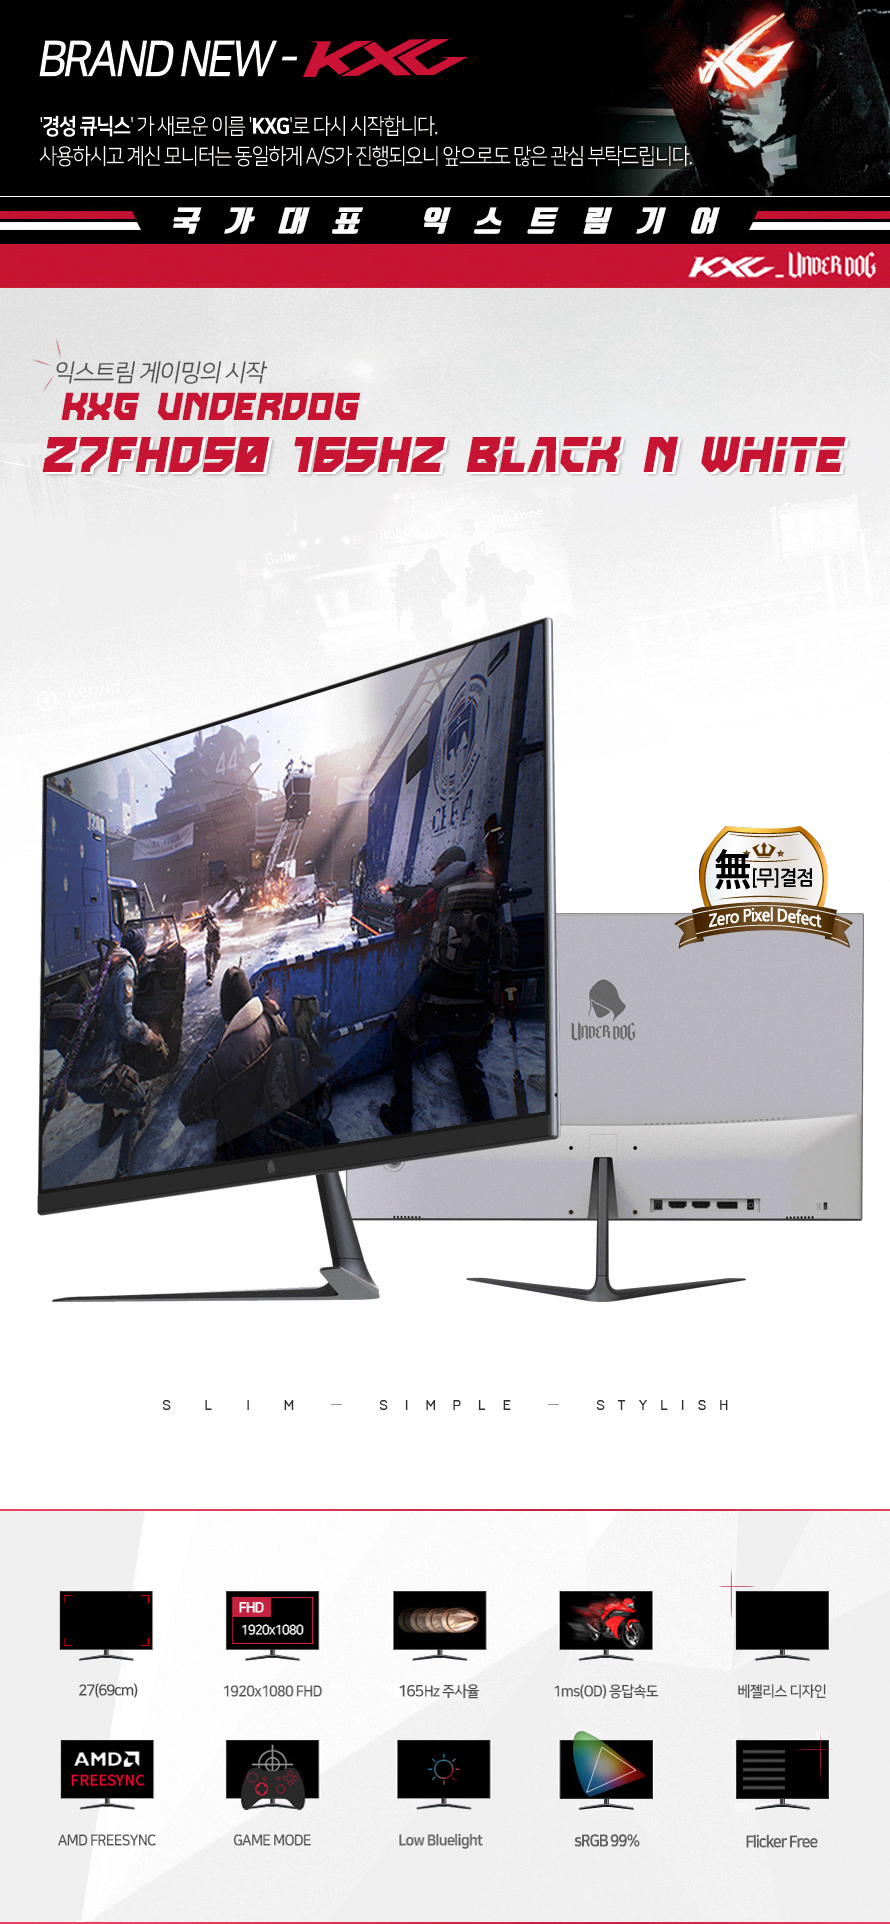 KXG UNDERDOG 27FHD50 165 BLACK N WHITE 무결점